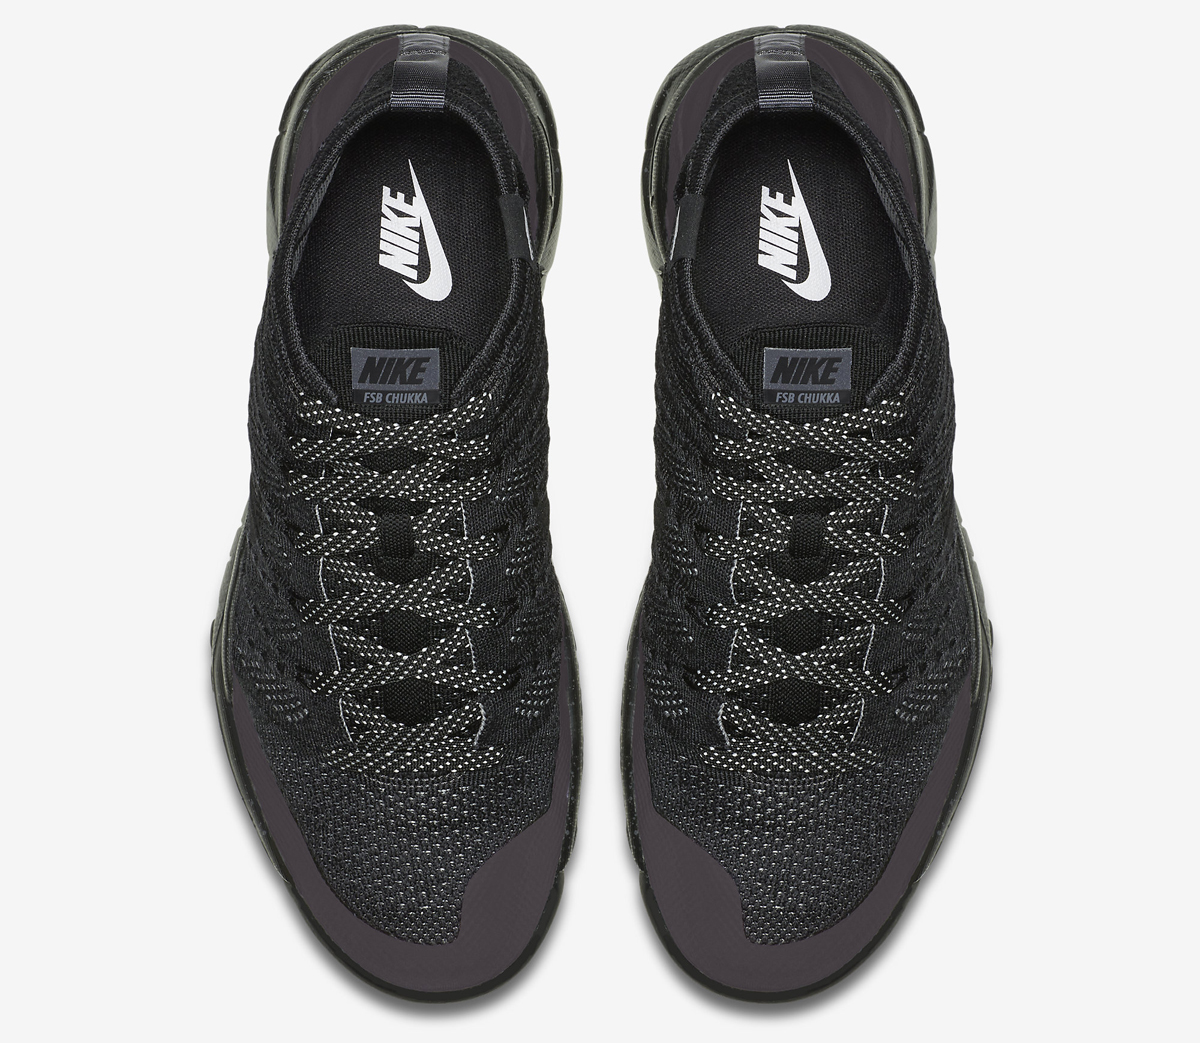 nike flyknit trainer chukka sneaker boot